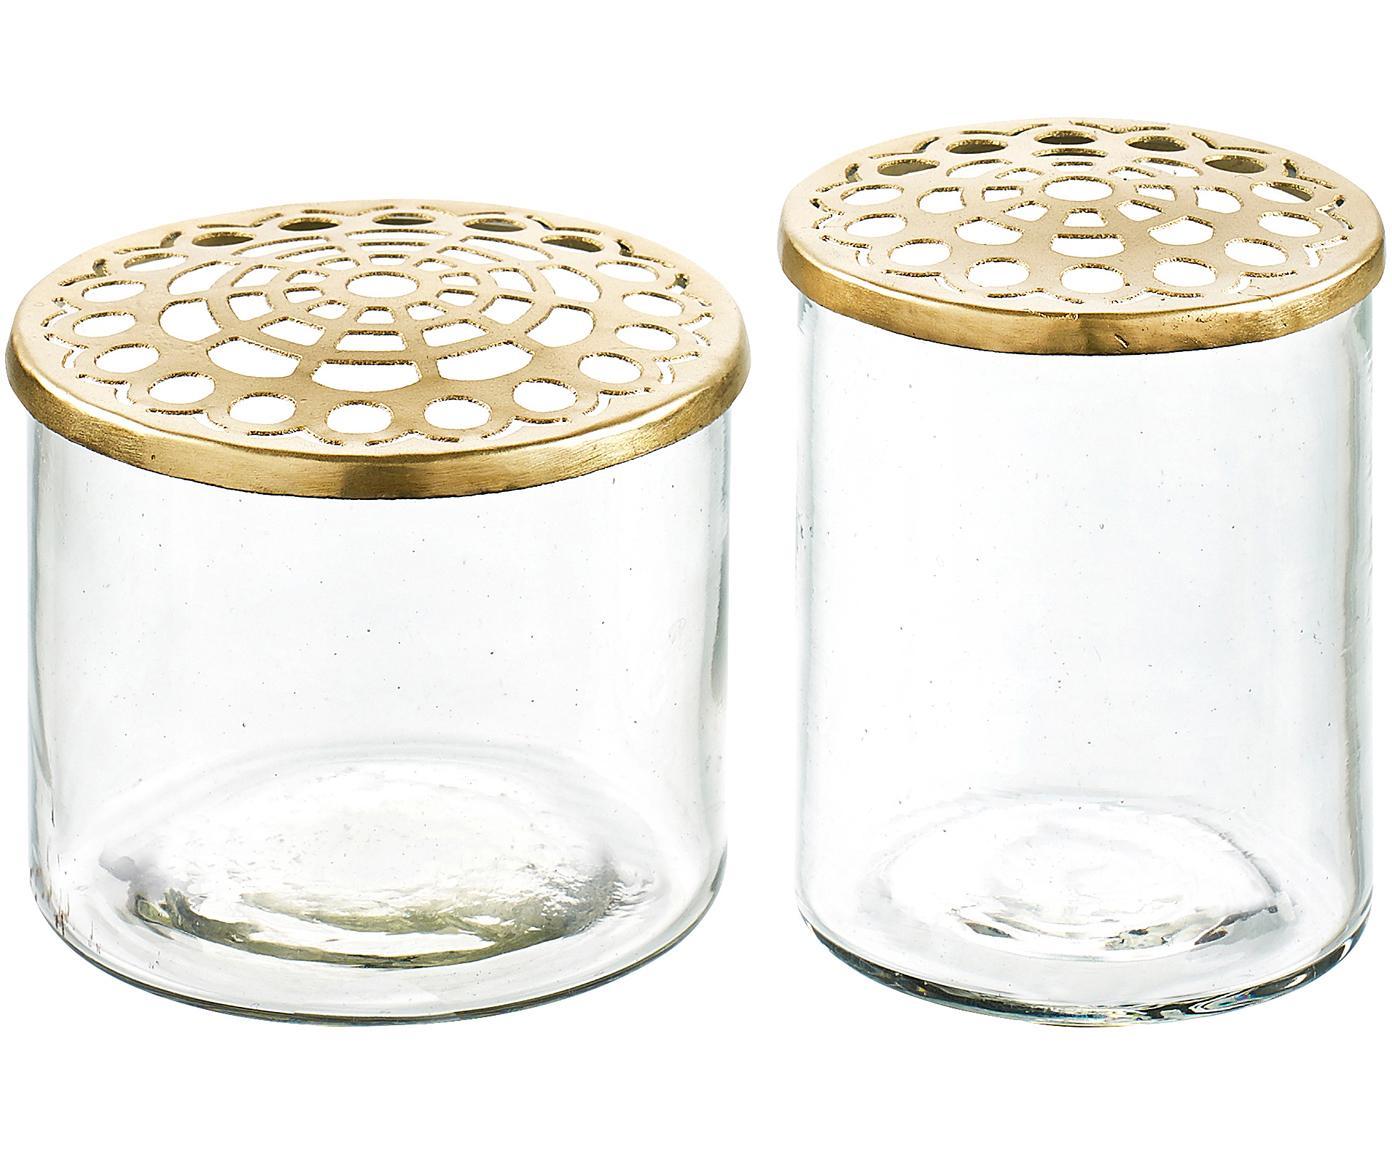 Set de jarrones pequeños Kastanje, 2pzas., Jarrón: vidrio, Jarrón: transparente Tapadera: latón, Tamaños diferentes